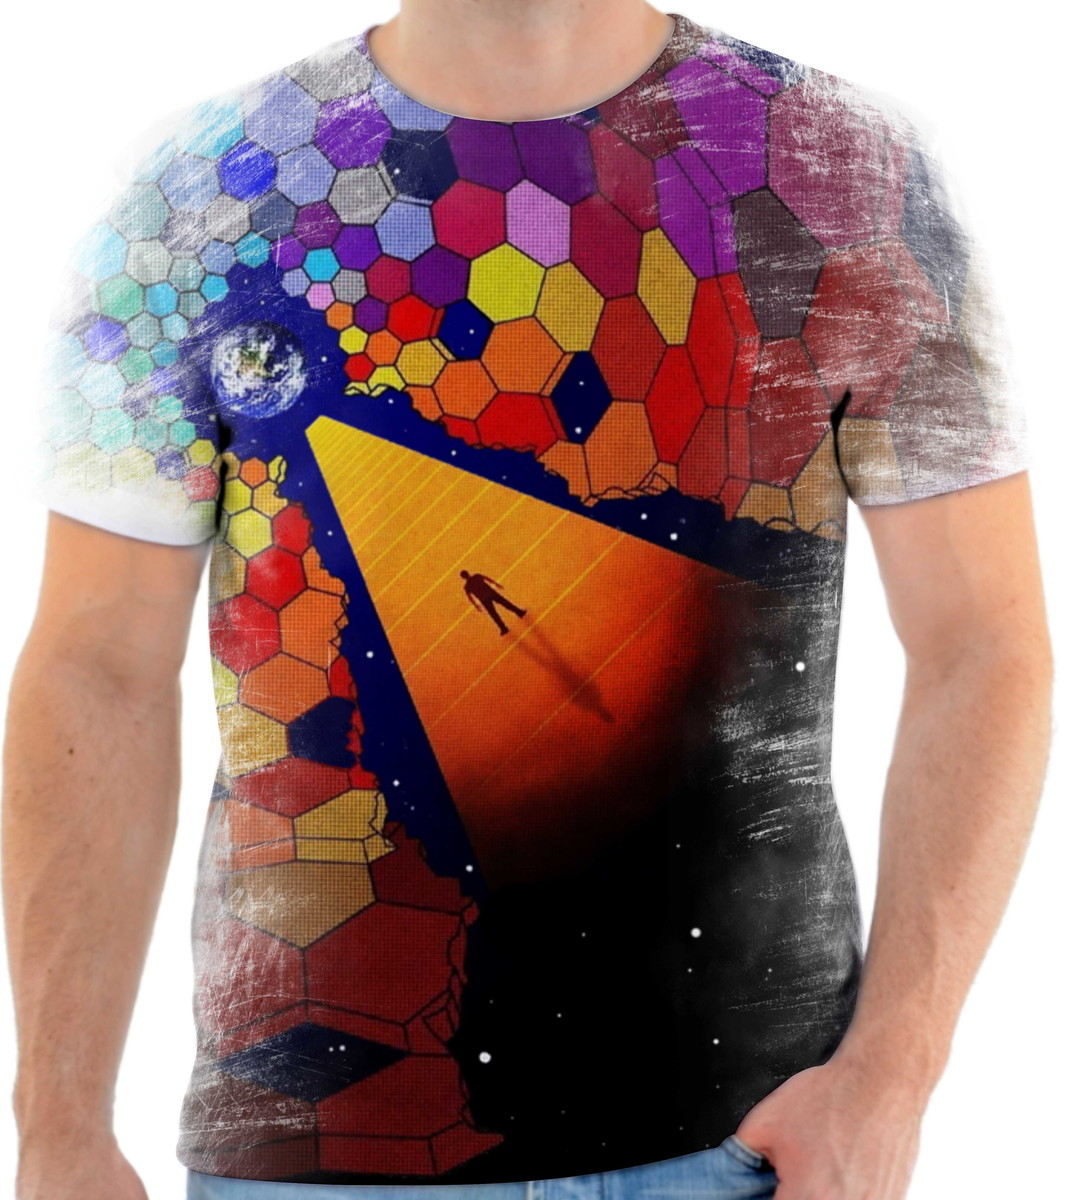 Camisa Camiseta Personalizada Banda De Rock Muse 3 no Elo7  24a2917a5c673